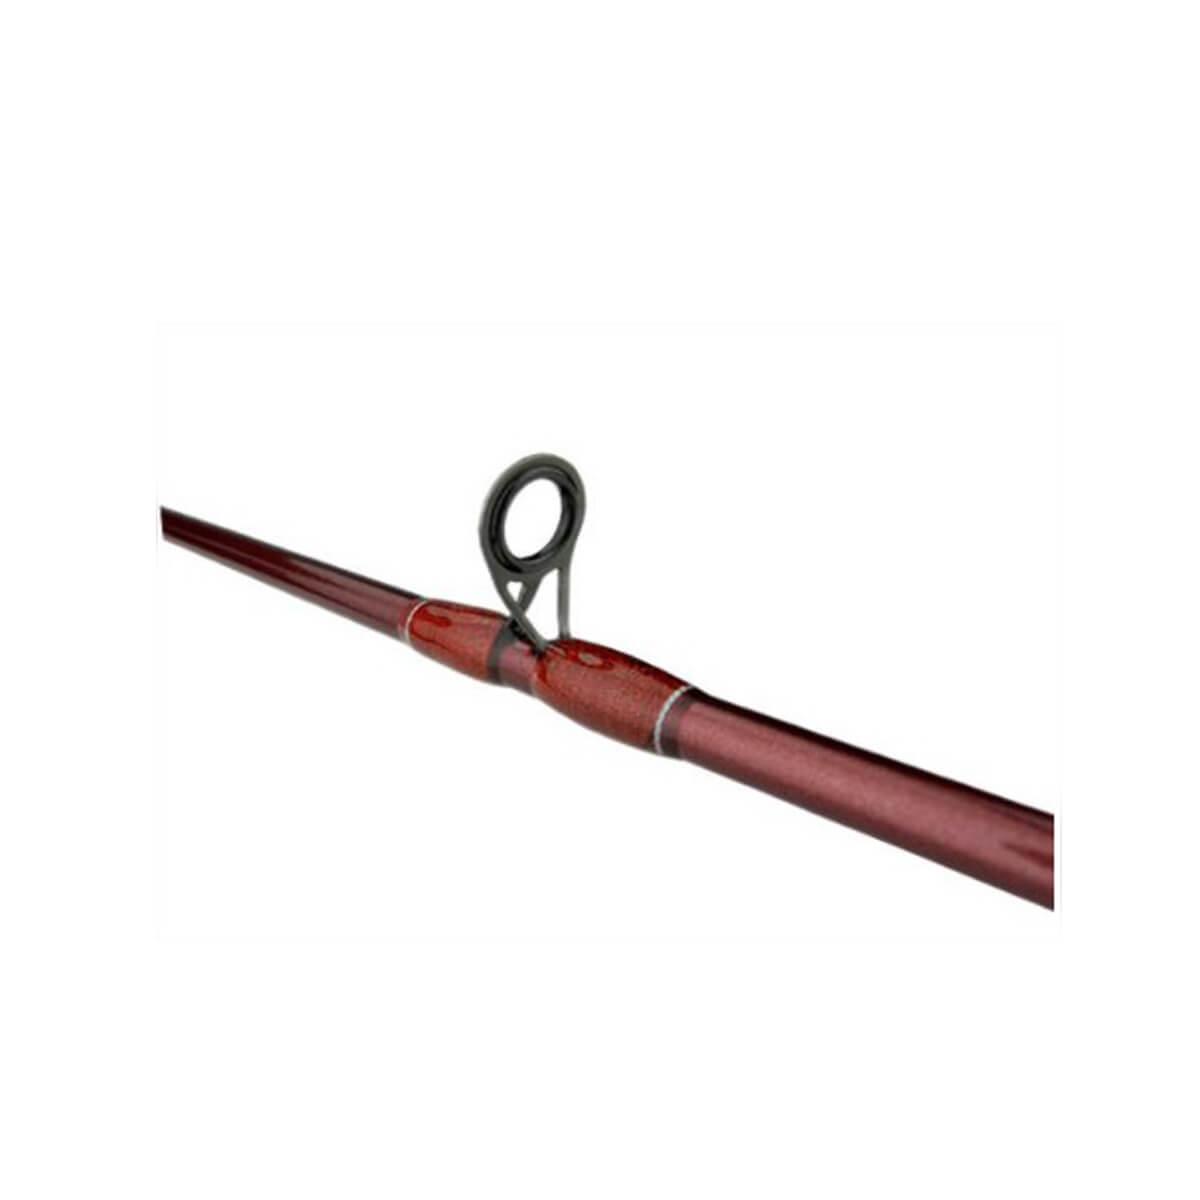 Vara Rapala Bronze Zx p/ Carretilha 6